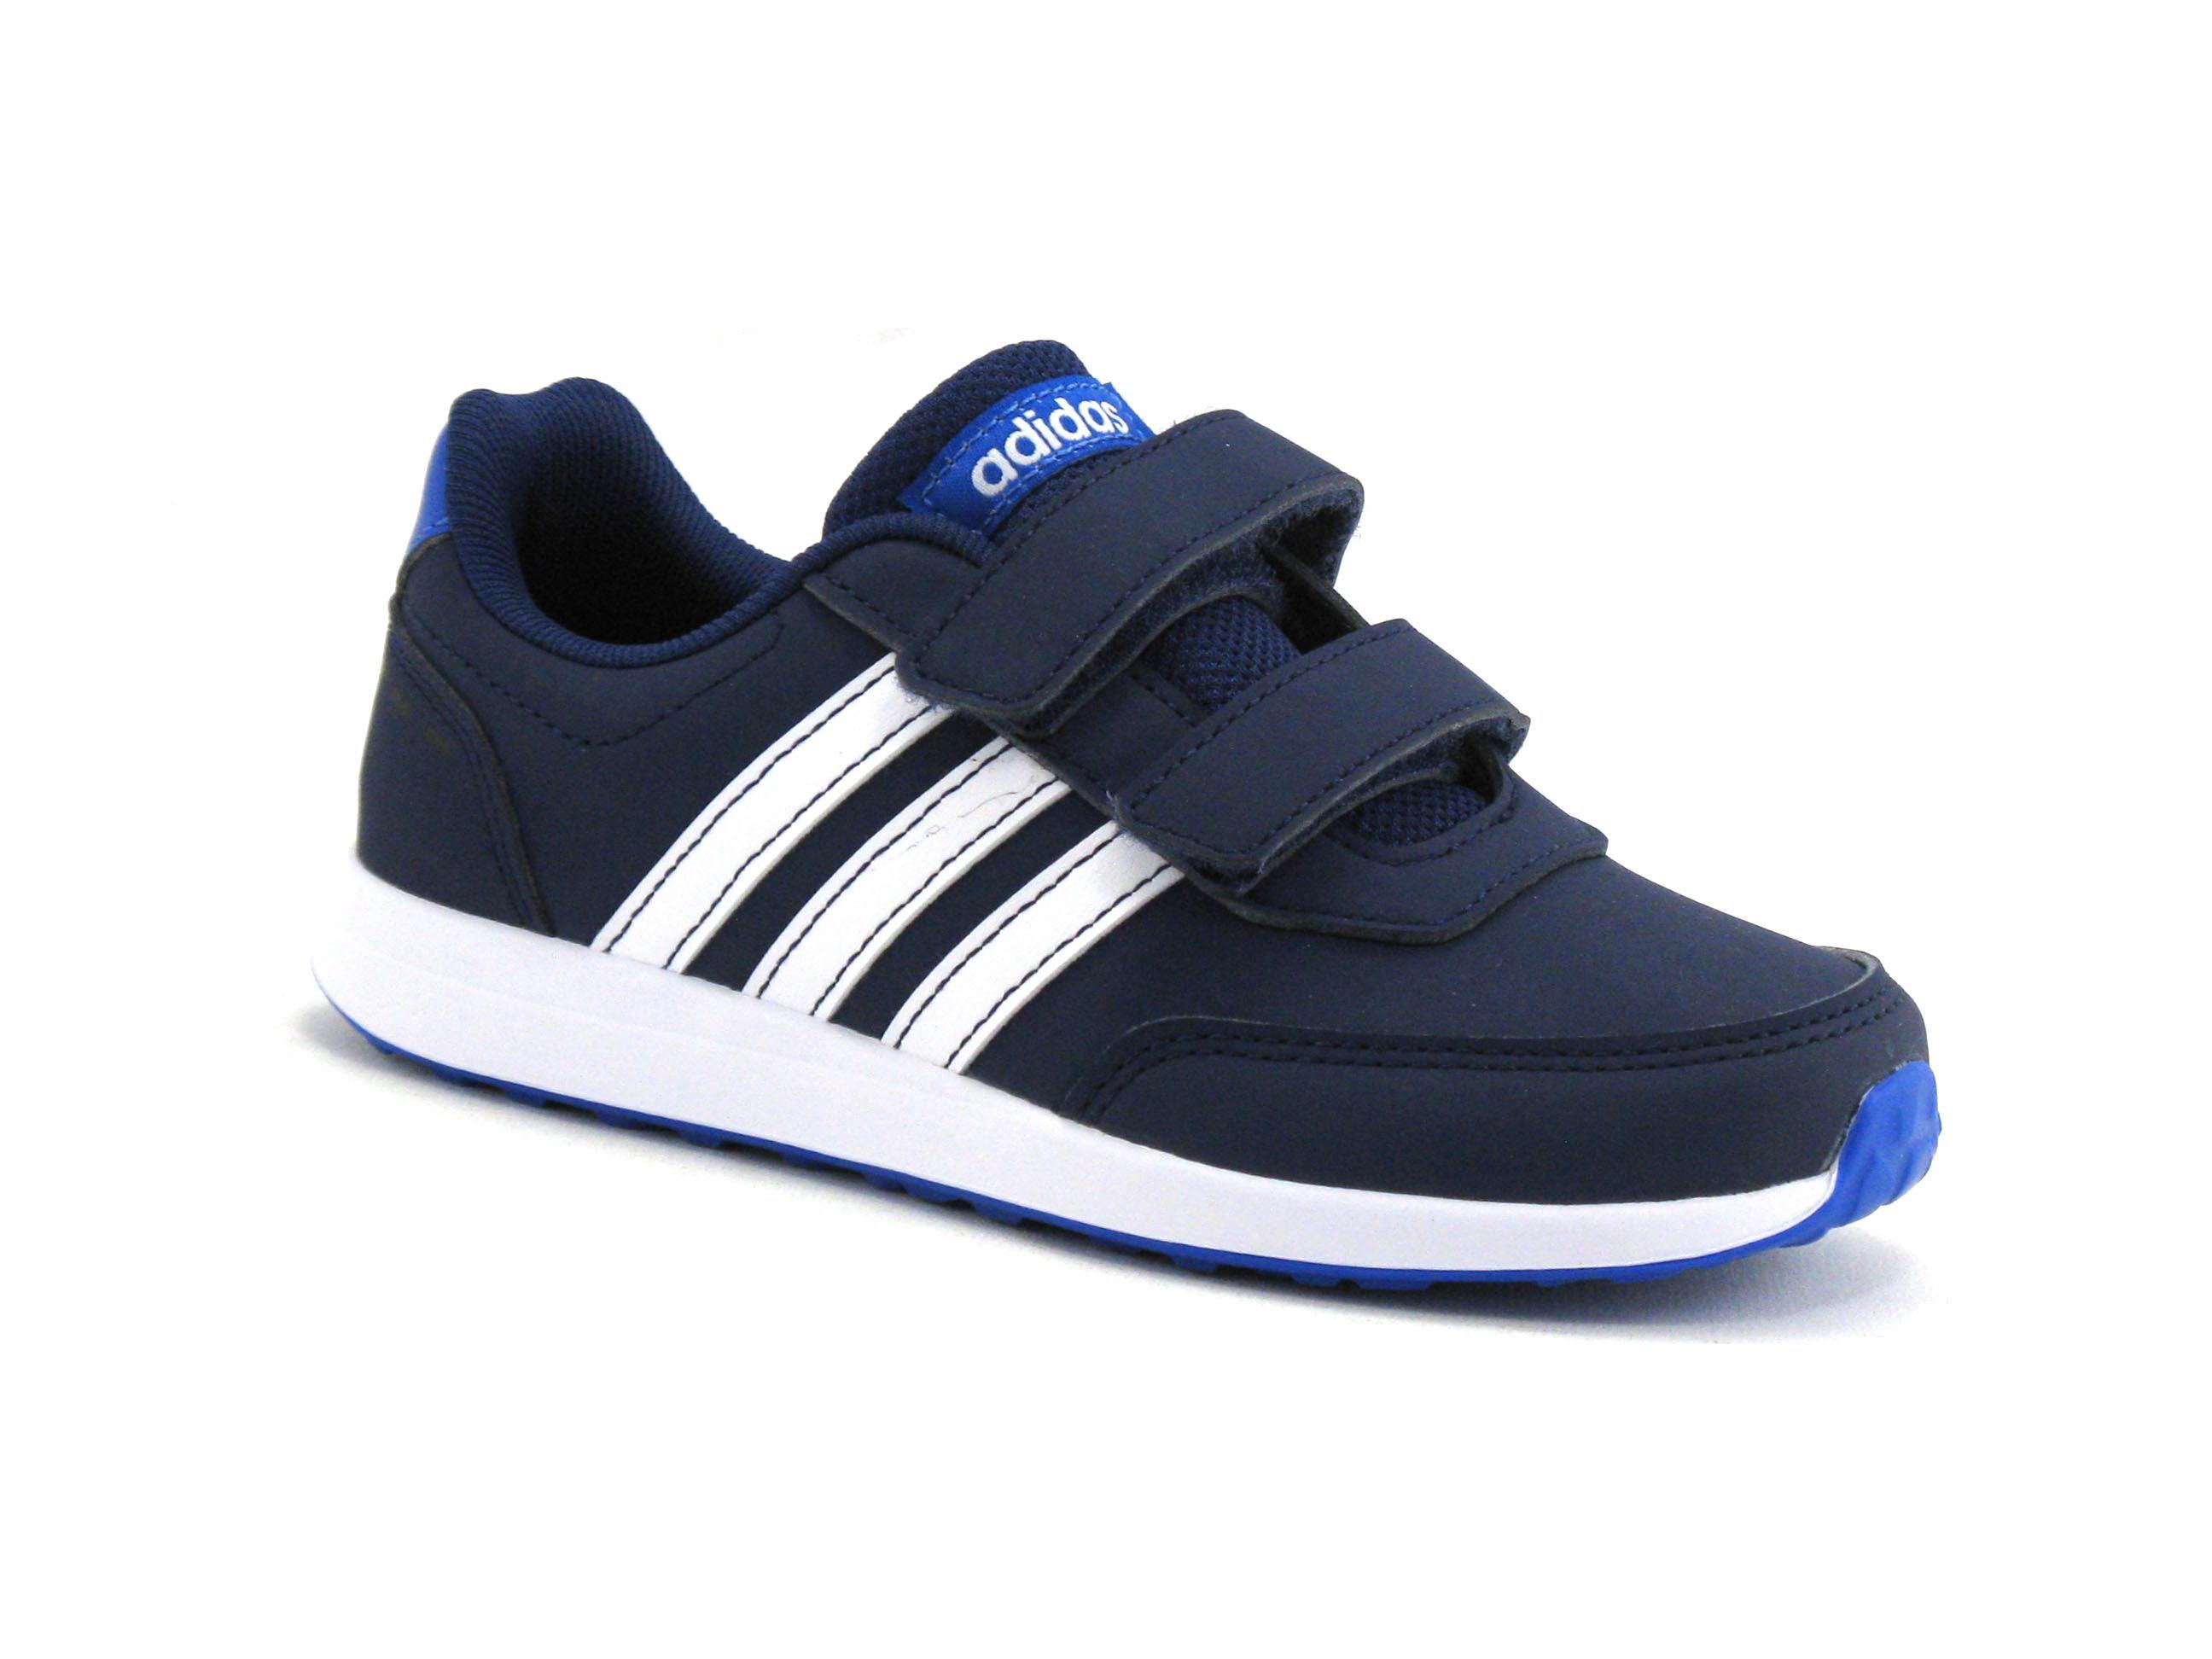 Adidas Basket Enfant Adidas - Bleu - Point. 28,29,30,31,32,33,34,35